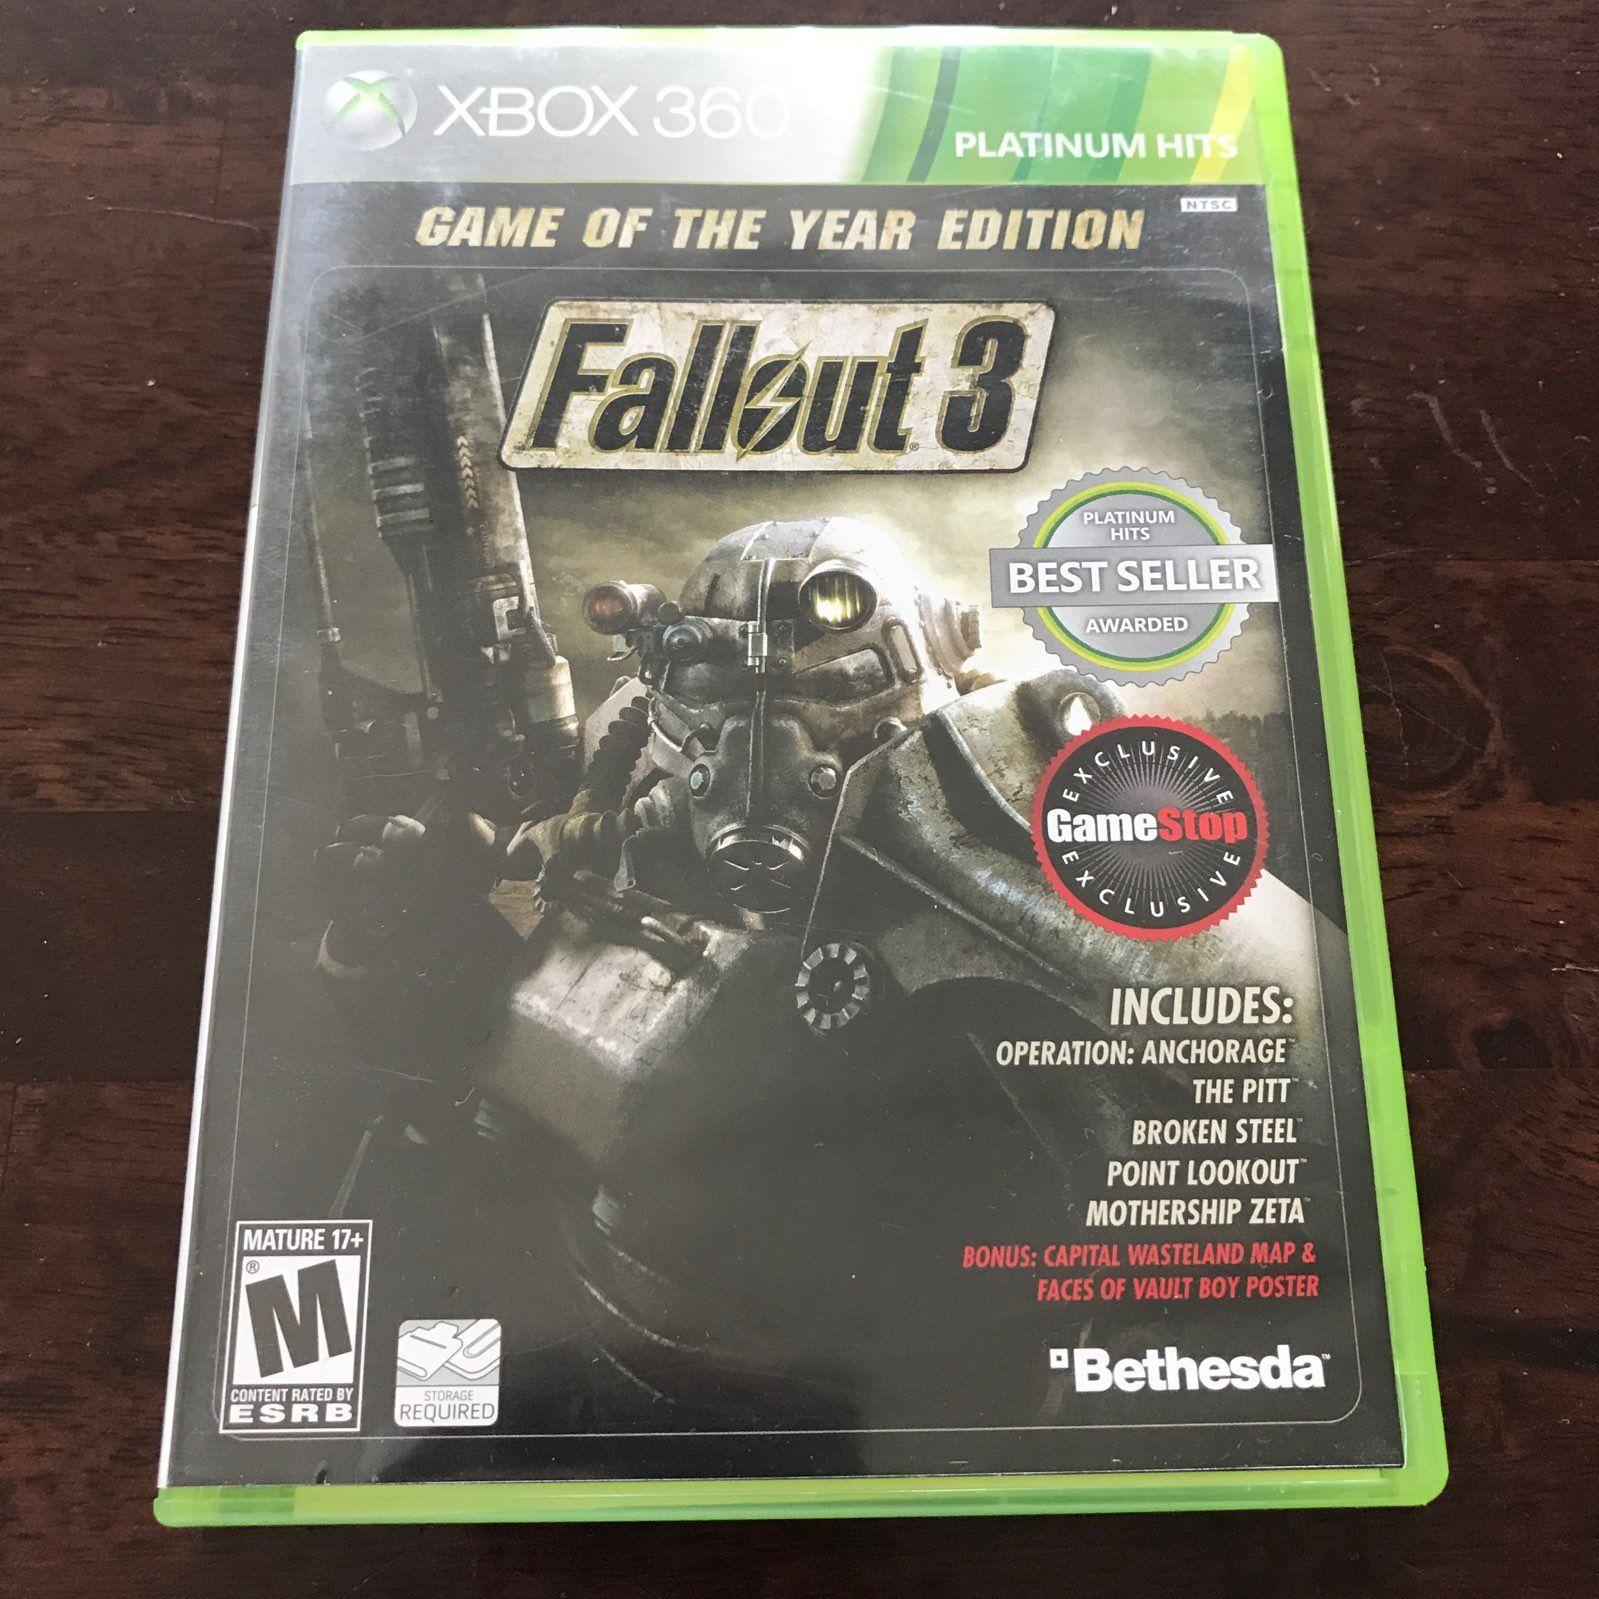 Fallout 3 Xbox 360 GOTY GameStop edition Mercari BUY SELL